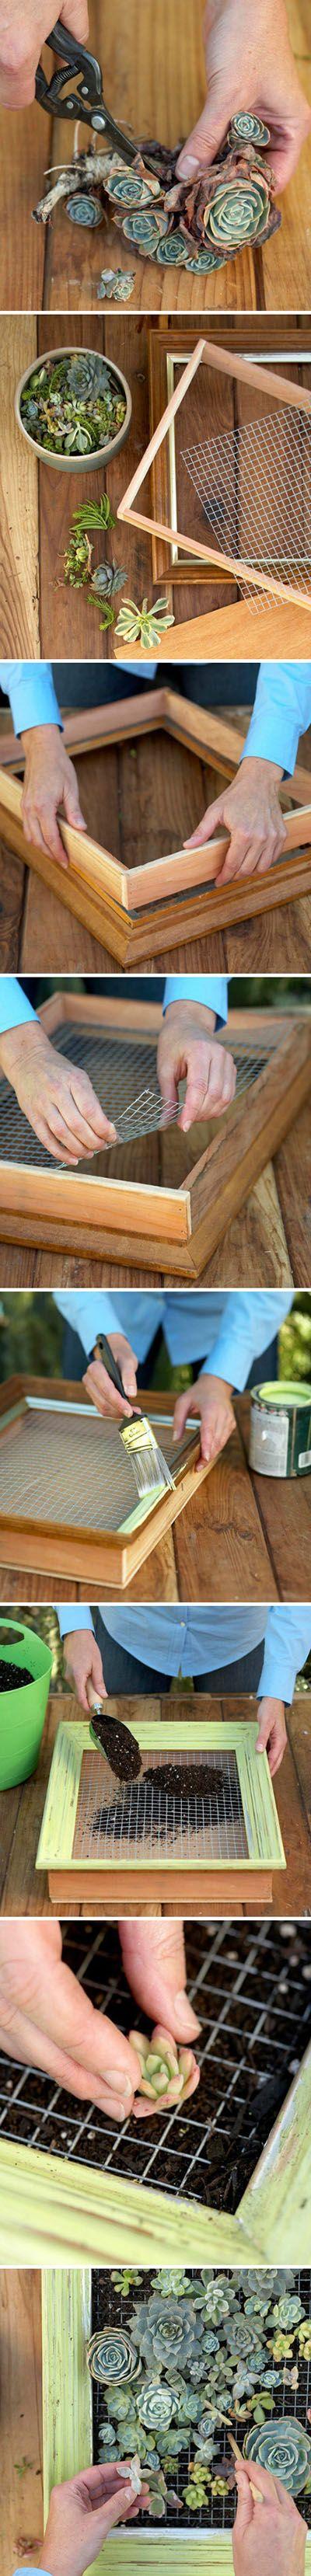 Great Bonsai Idea | DIY & Crafts